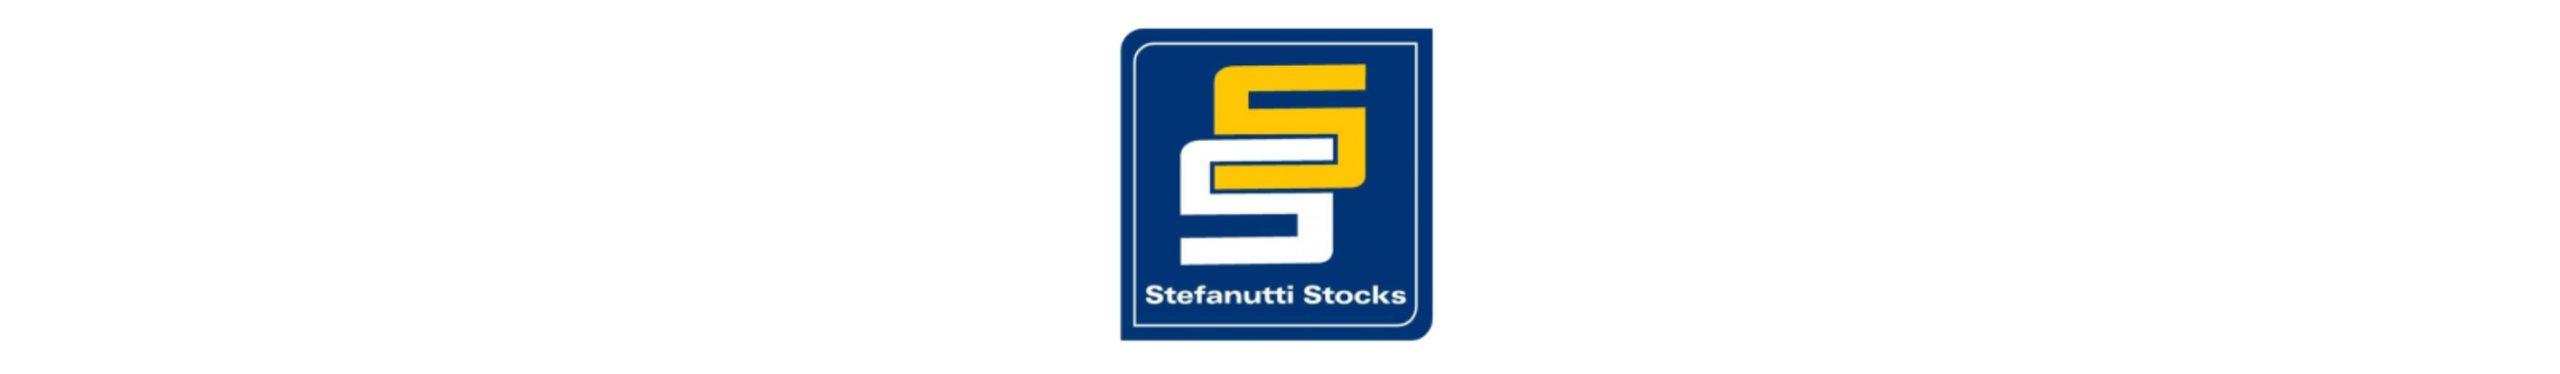 STEF STOCKS